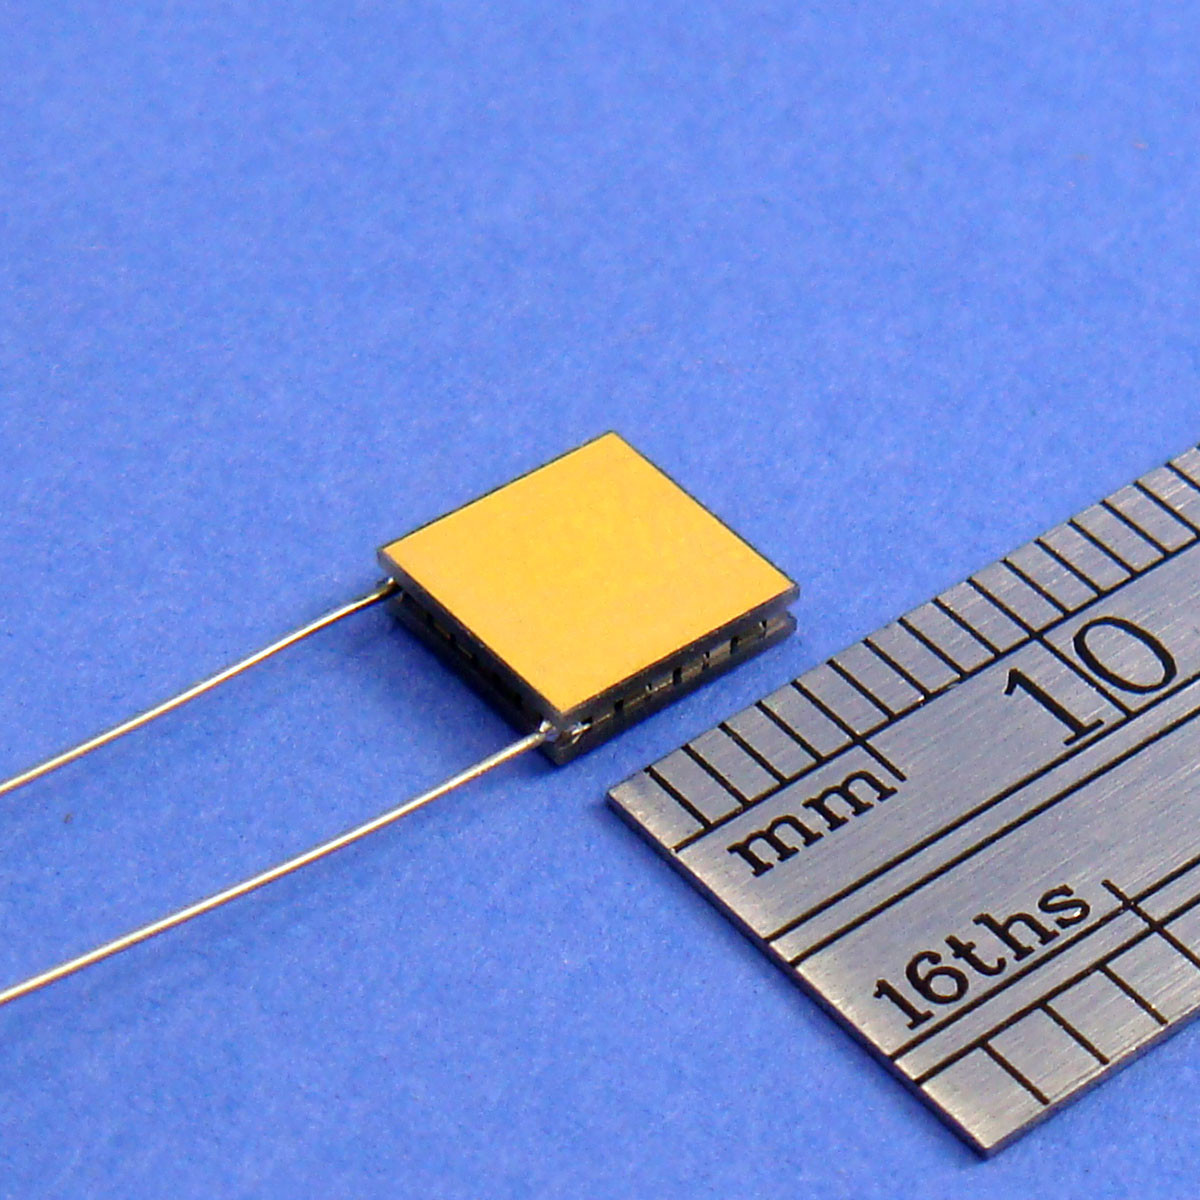 03101-9B30-30RU7 Thermoelectric/Peltier Mini Module